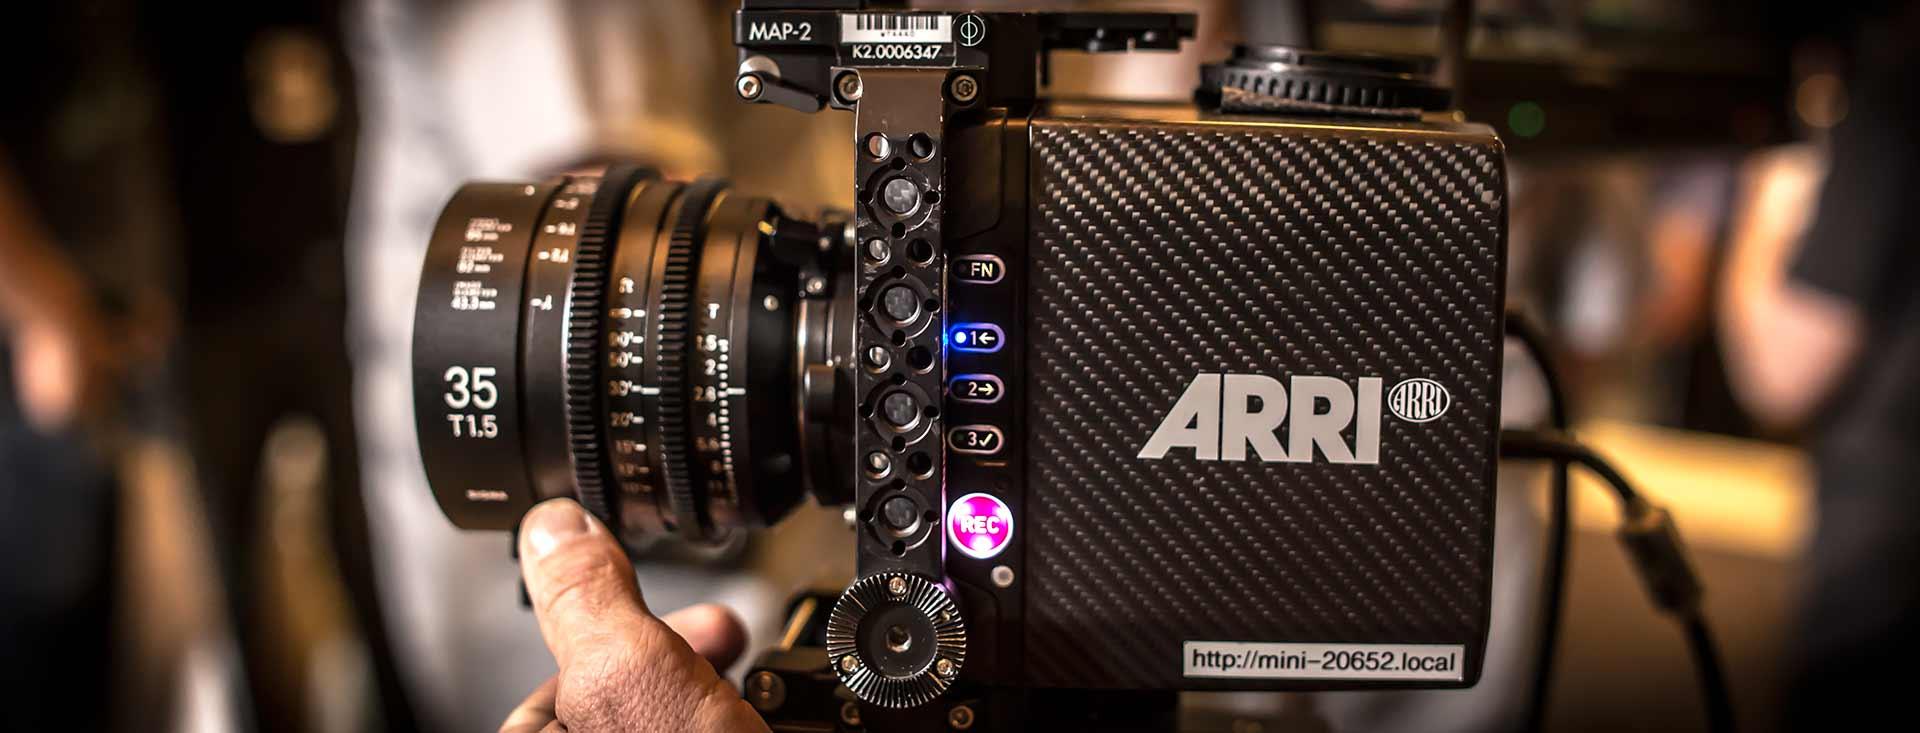 Camera Leasing & Financing